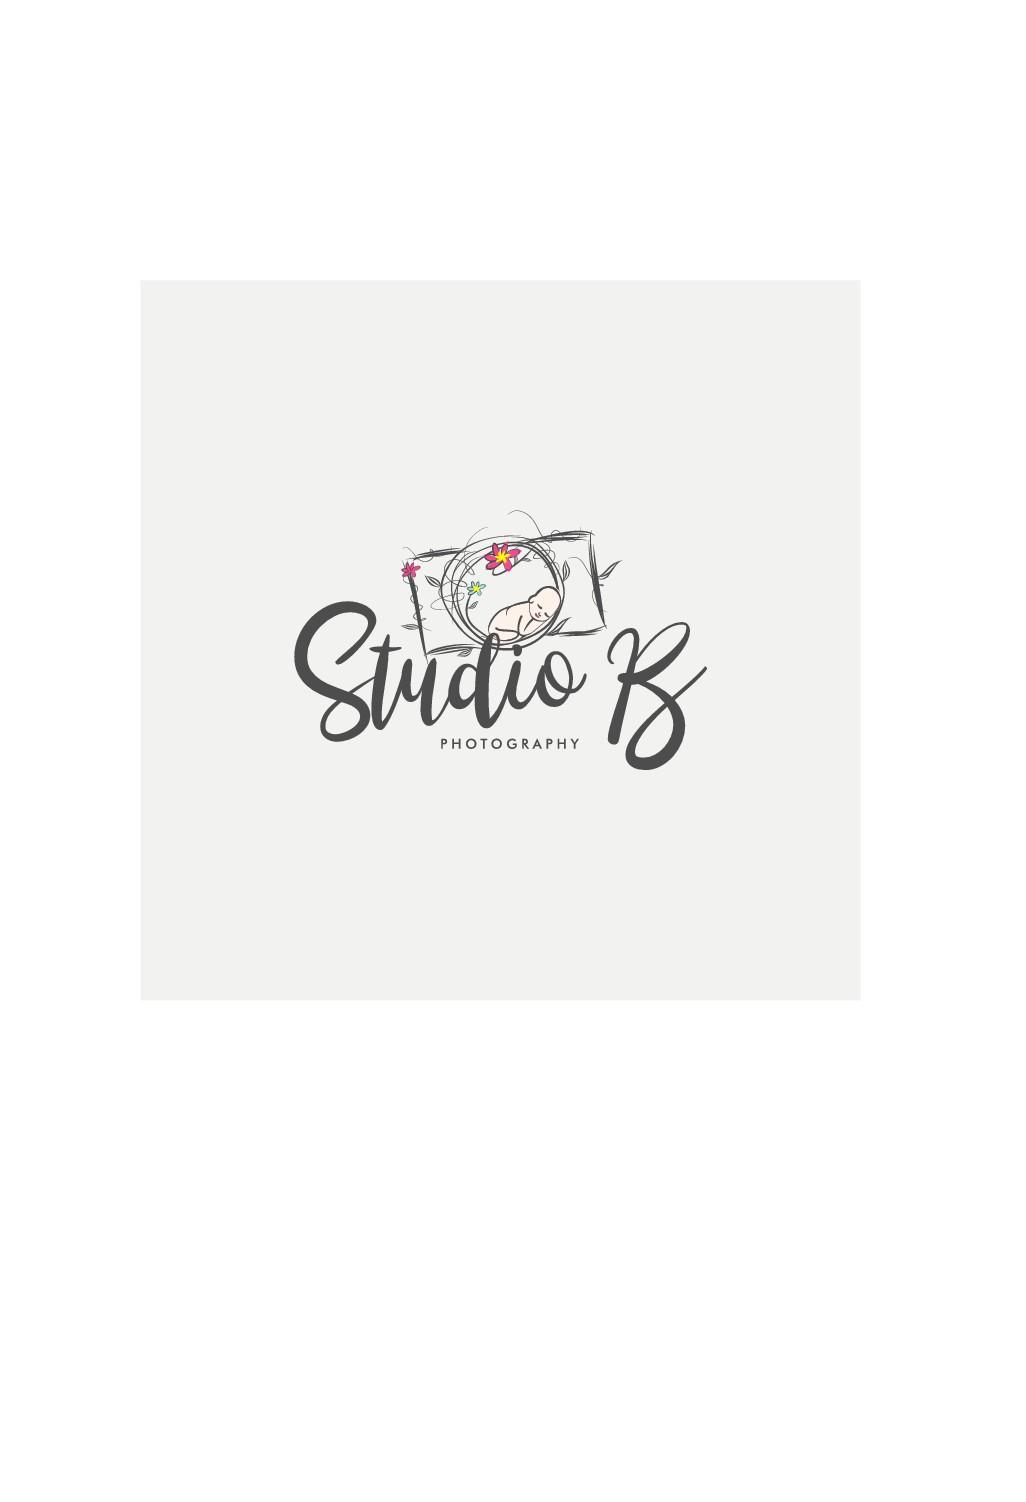 Studio B is looking for an amazingly beautiful logo